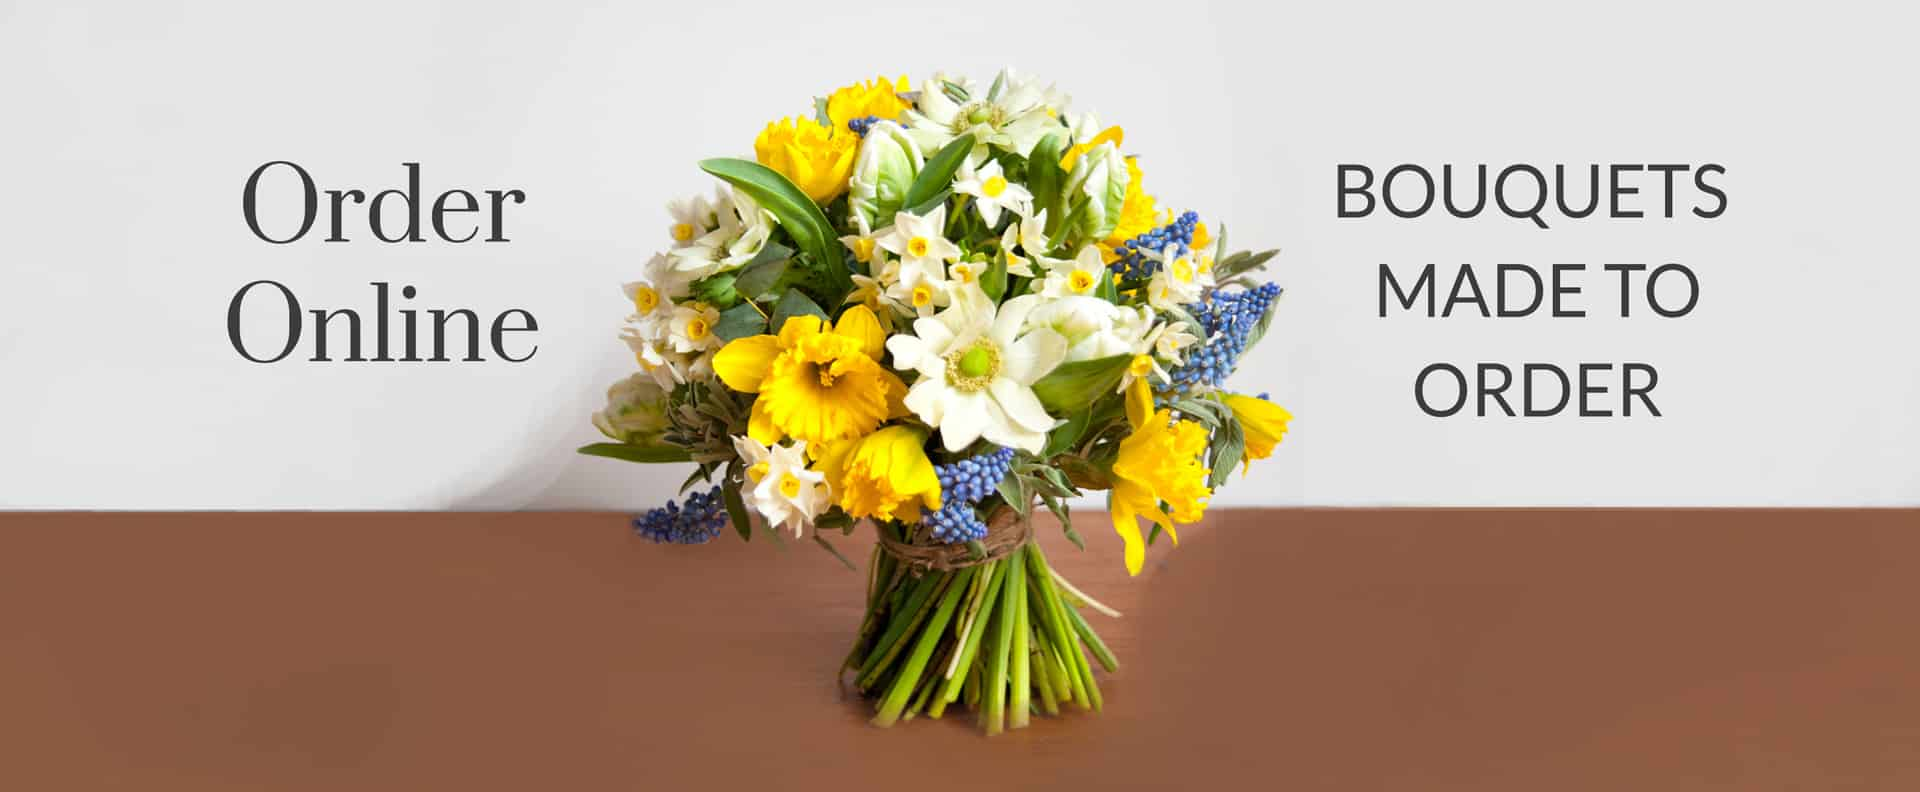 Prat And Lato Test On Image Bouquet Slide Sweet Pea Flowers